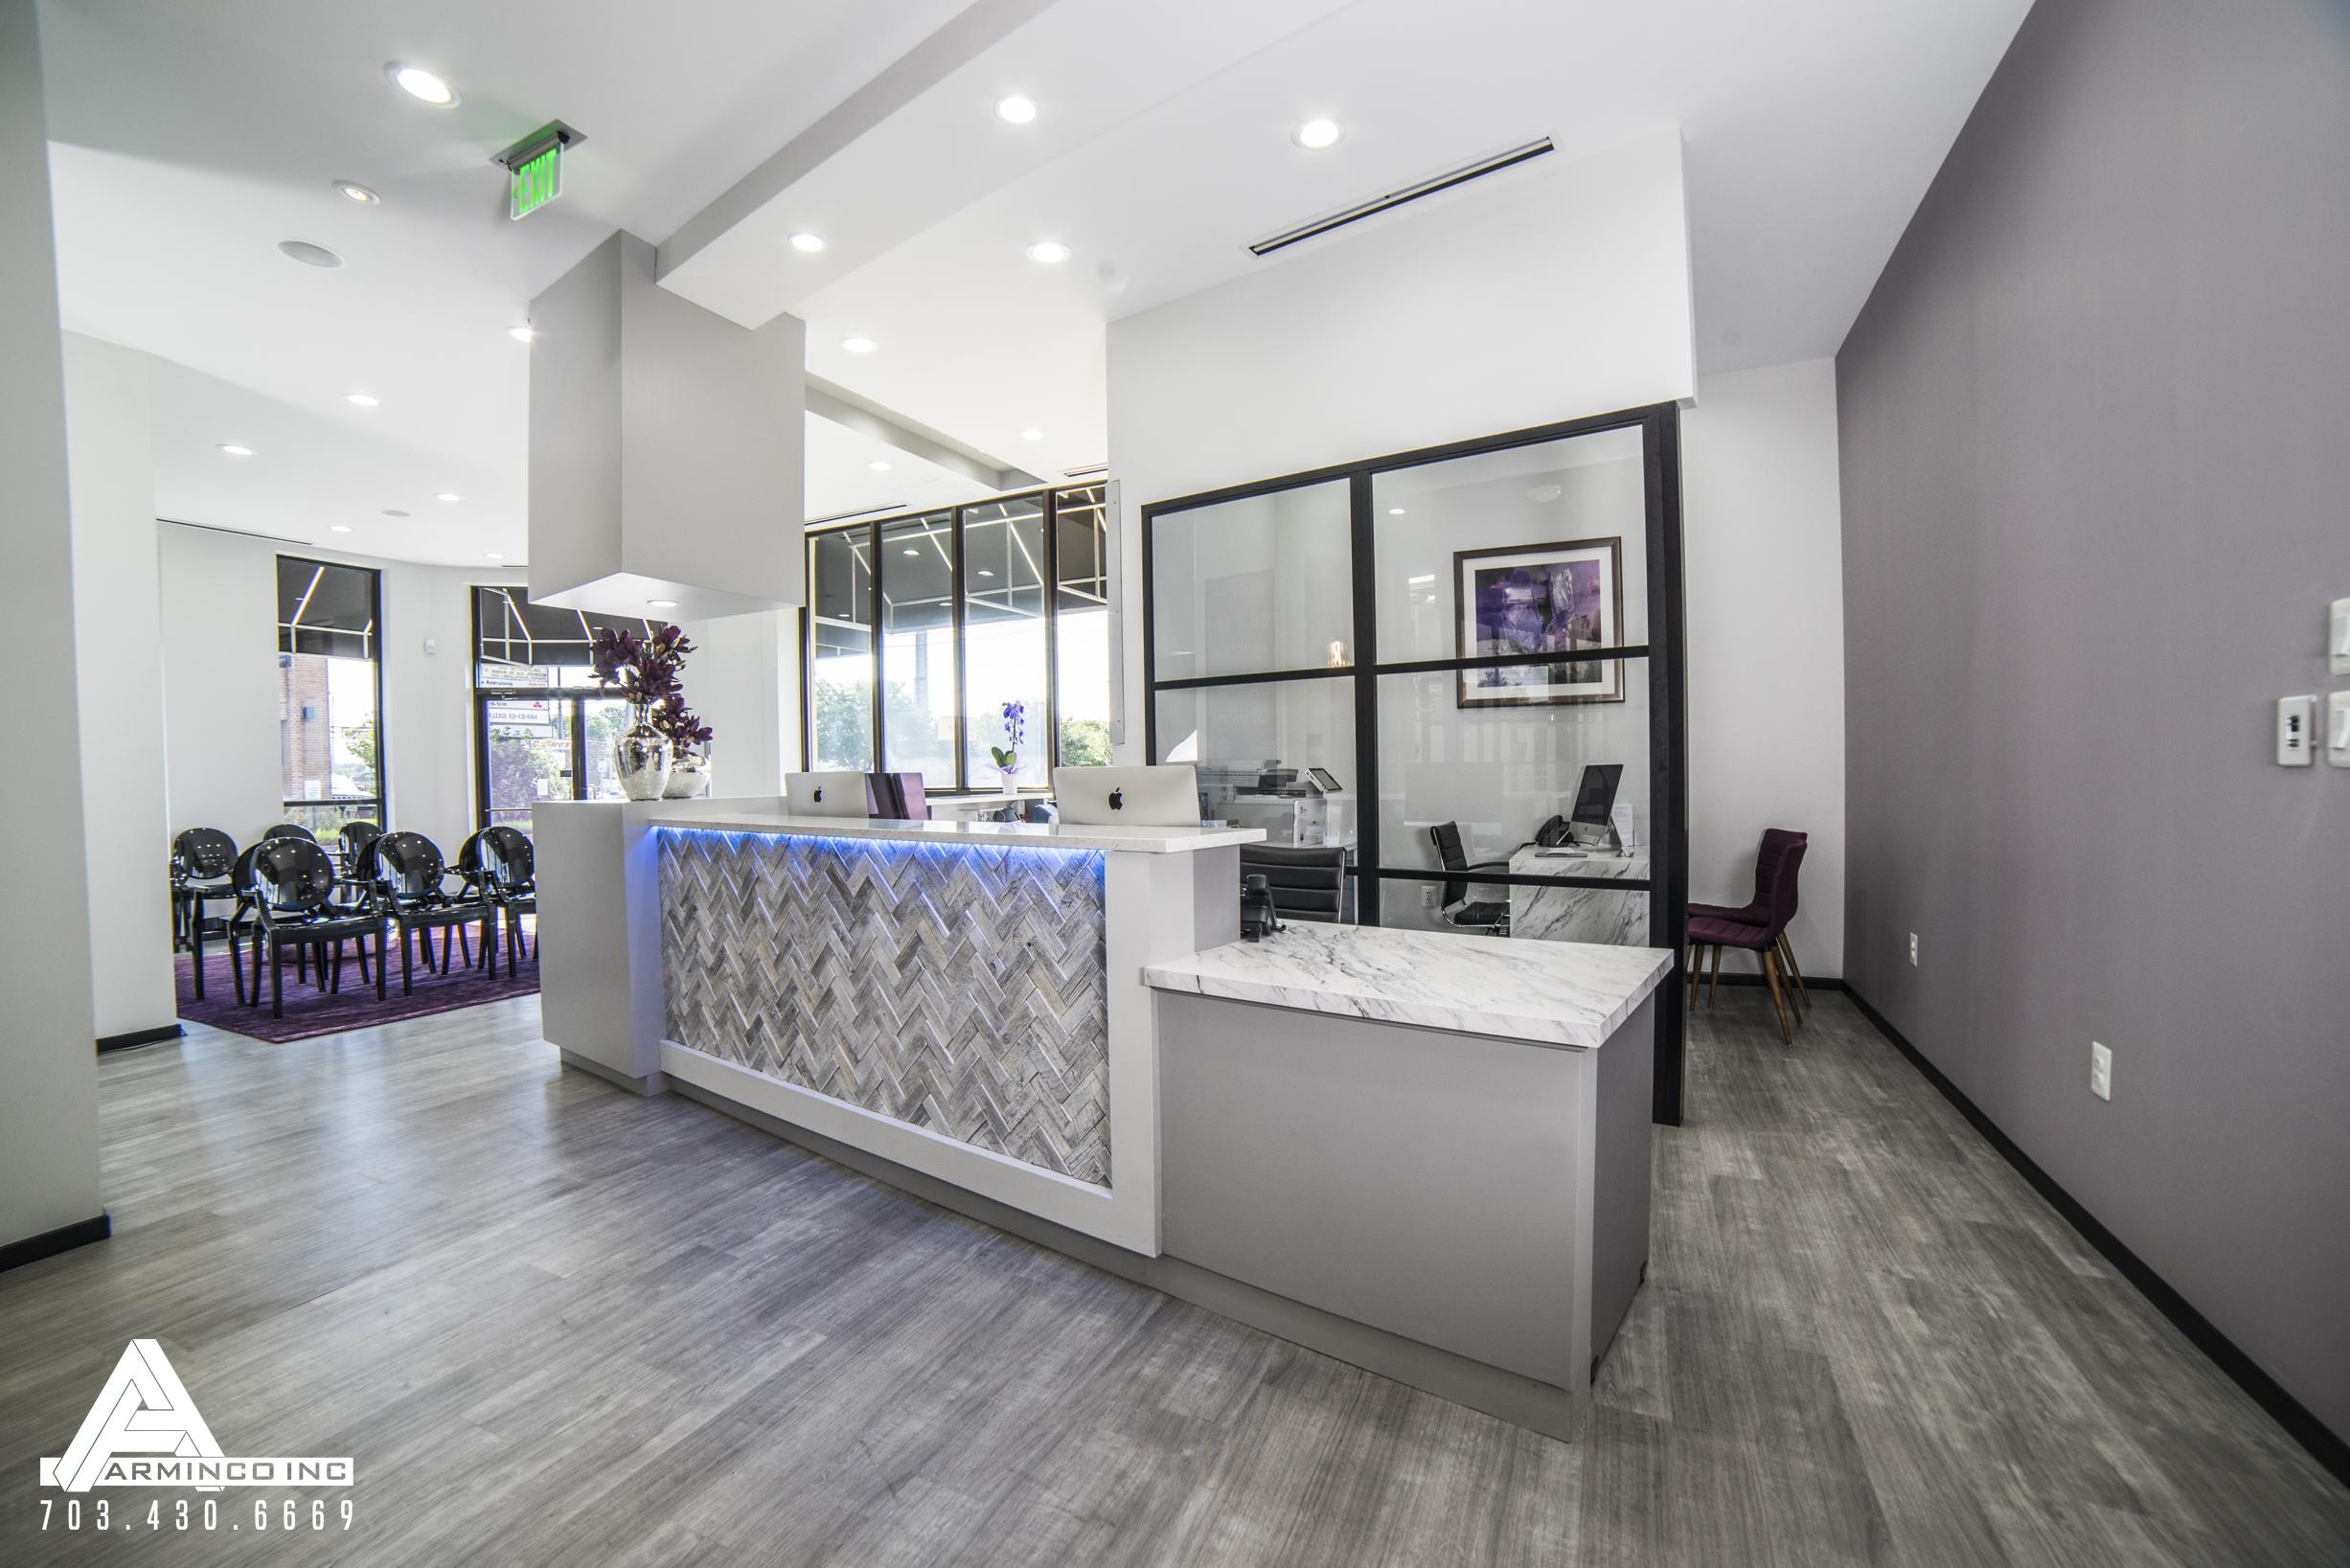 Dental Office Design by Arminco Inc. … Medical office